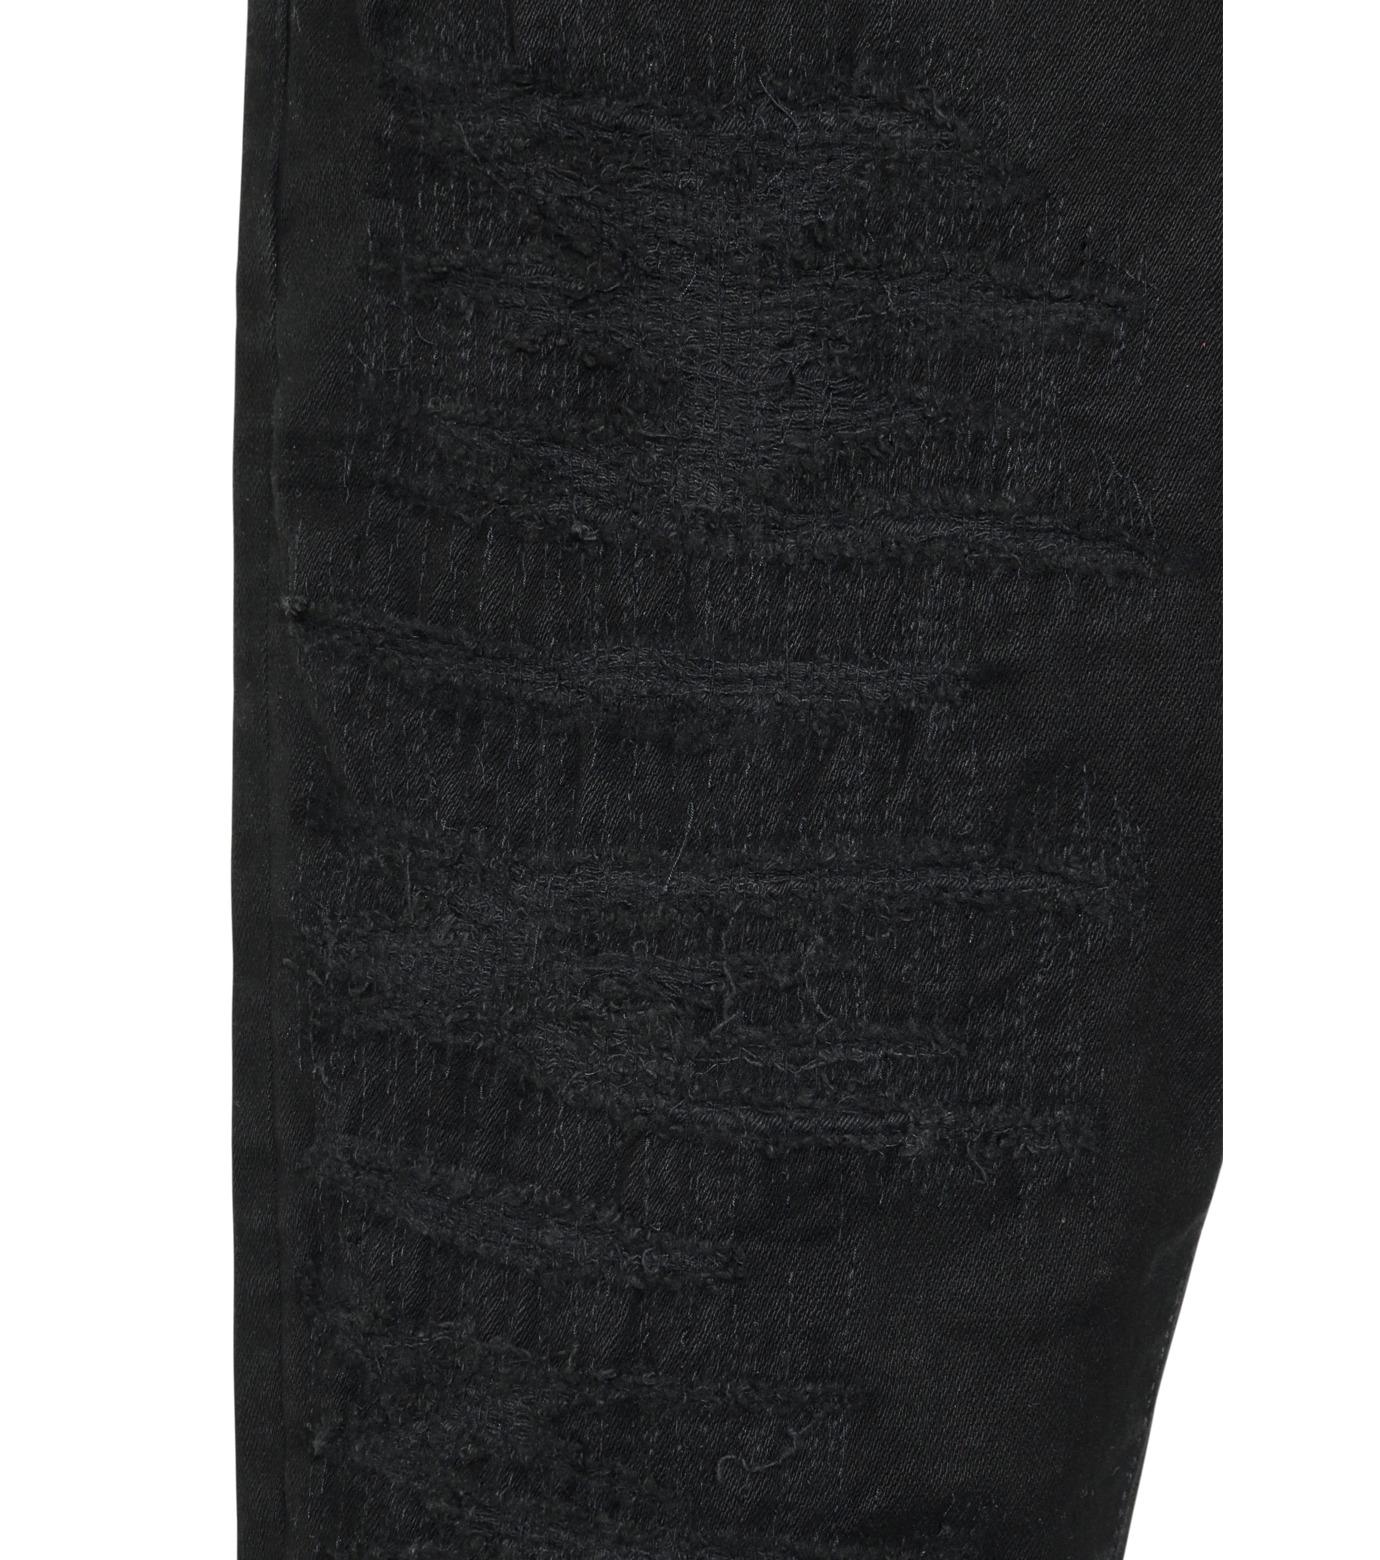 HL HEDDIE LOVU(エイチエル・エディールーヴ)のblk damage3 skin slim-BLACK(パンツ/pants)-18S98003-13 拡大詳細画像6